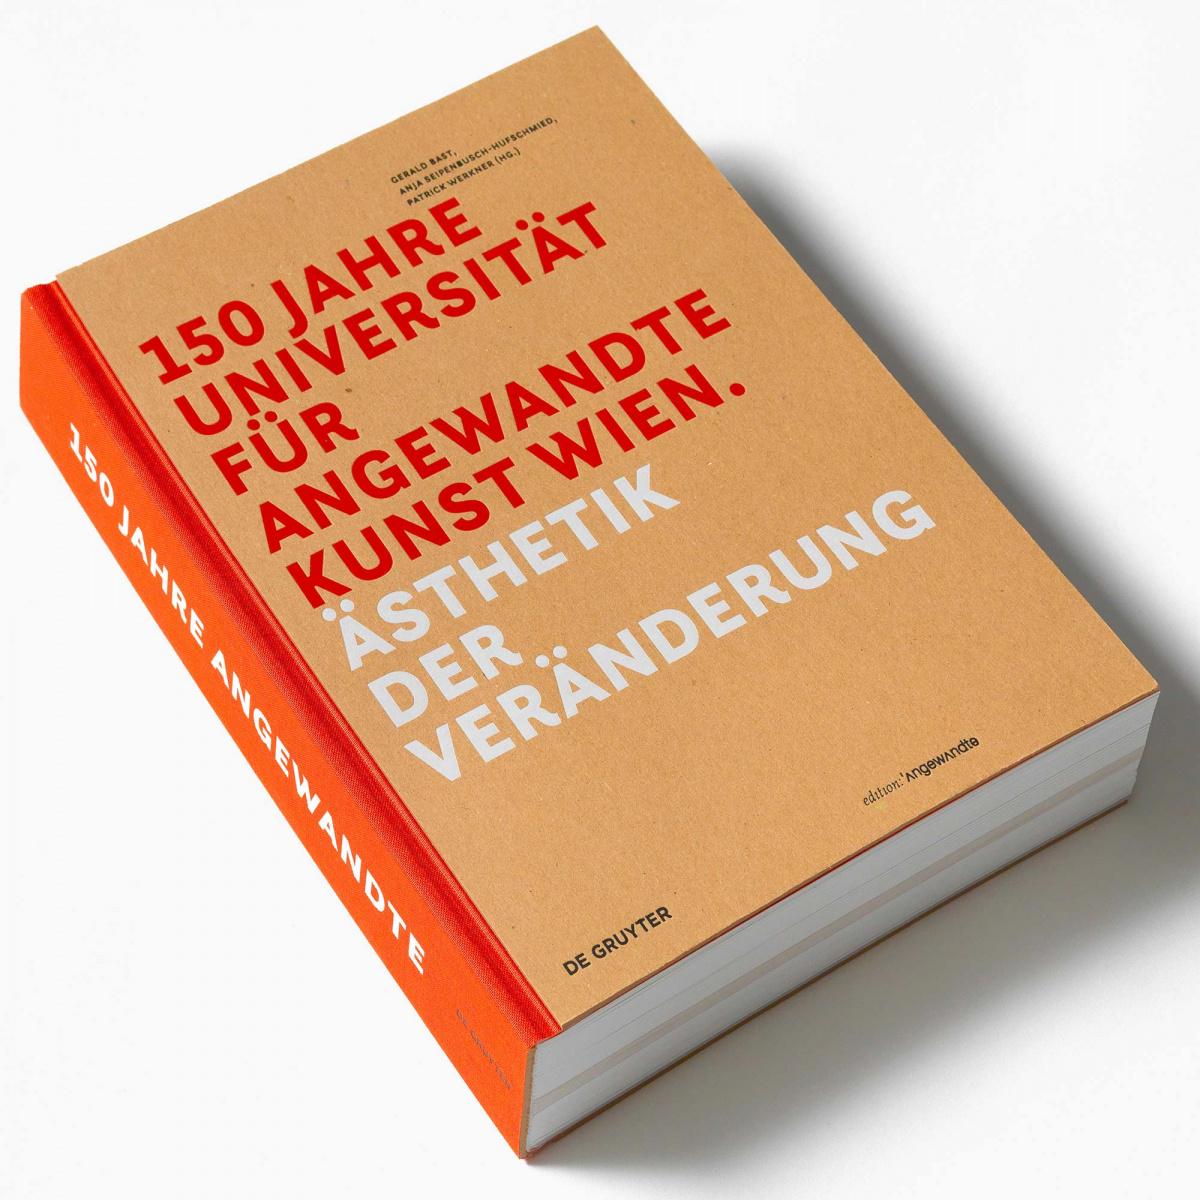 05 Anita Kern 150 Jahre Angewandte3